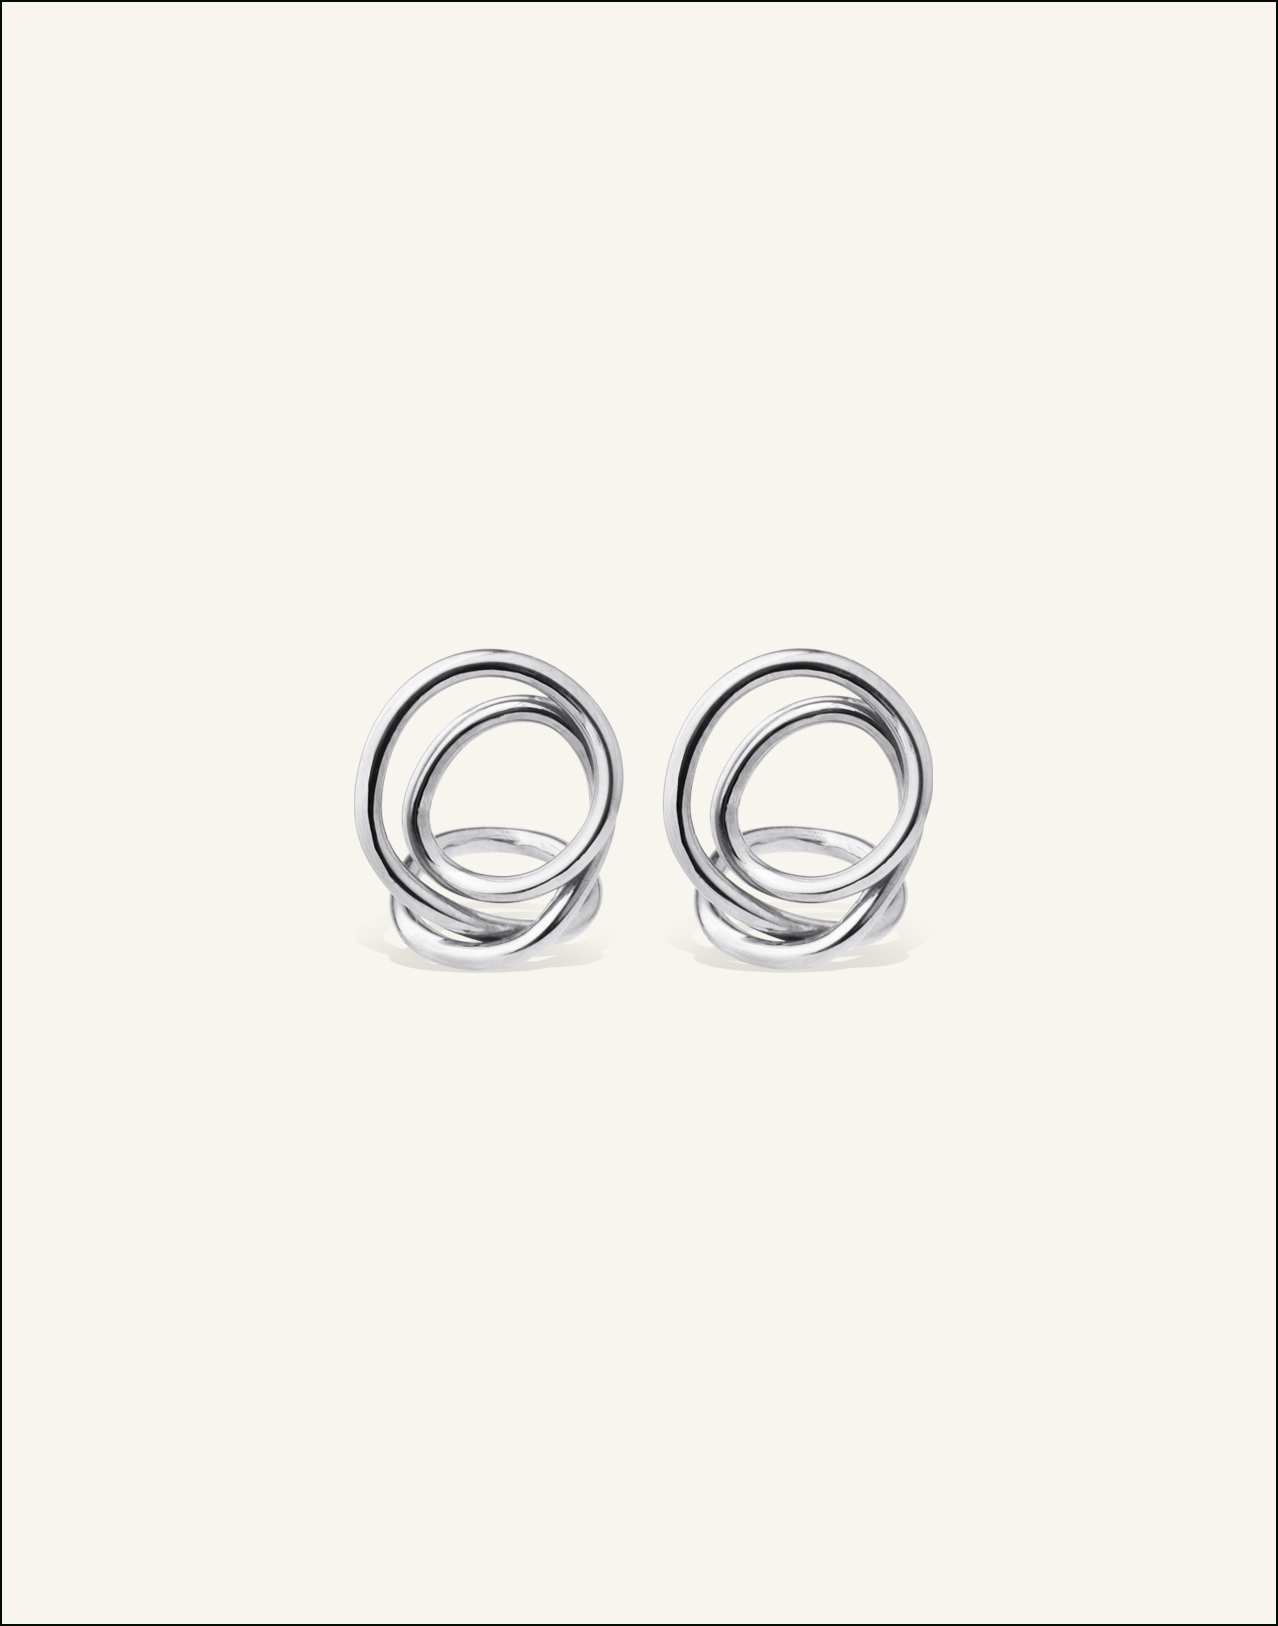 Completedworks-Silver-Earrings-The-Philosopher-1-1.jpg